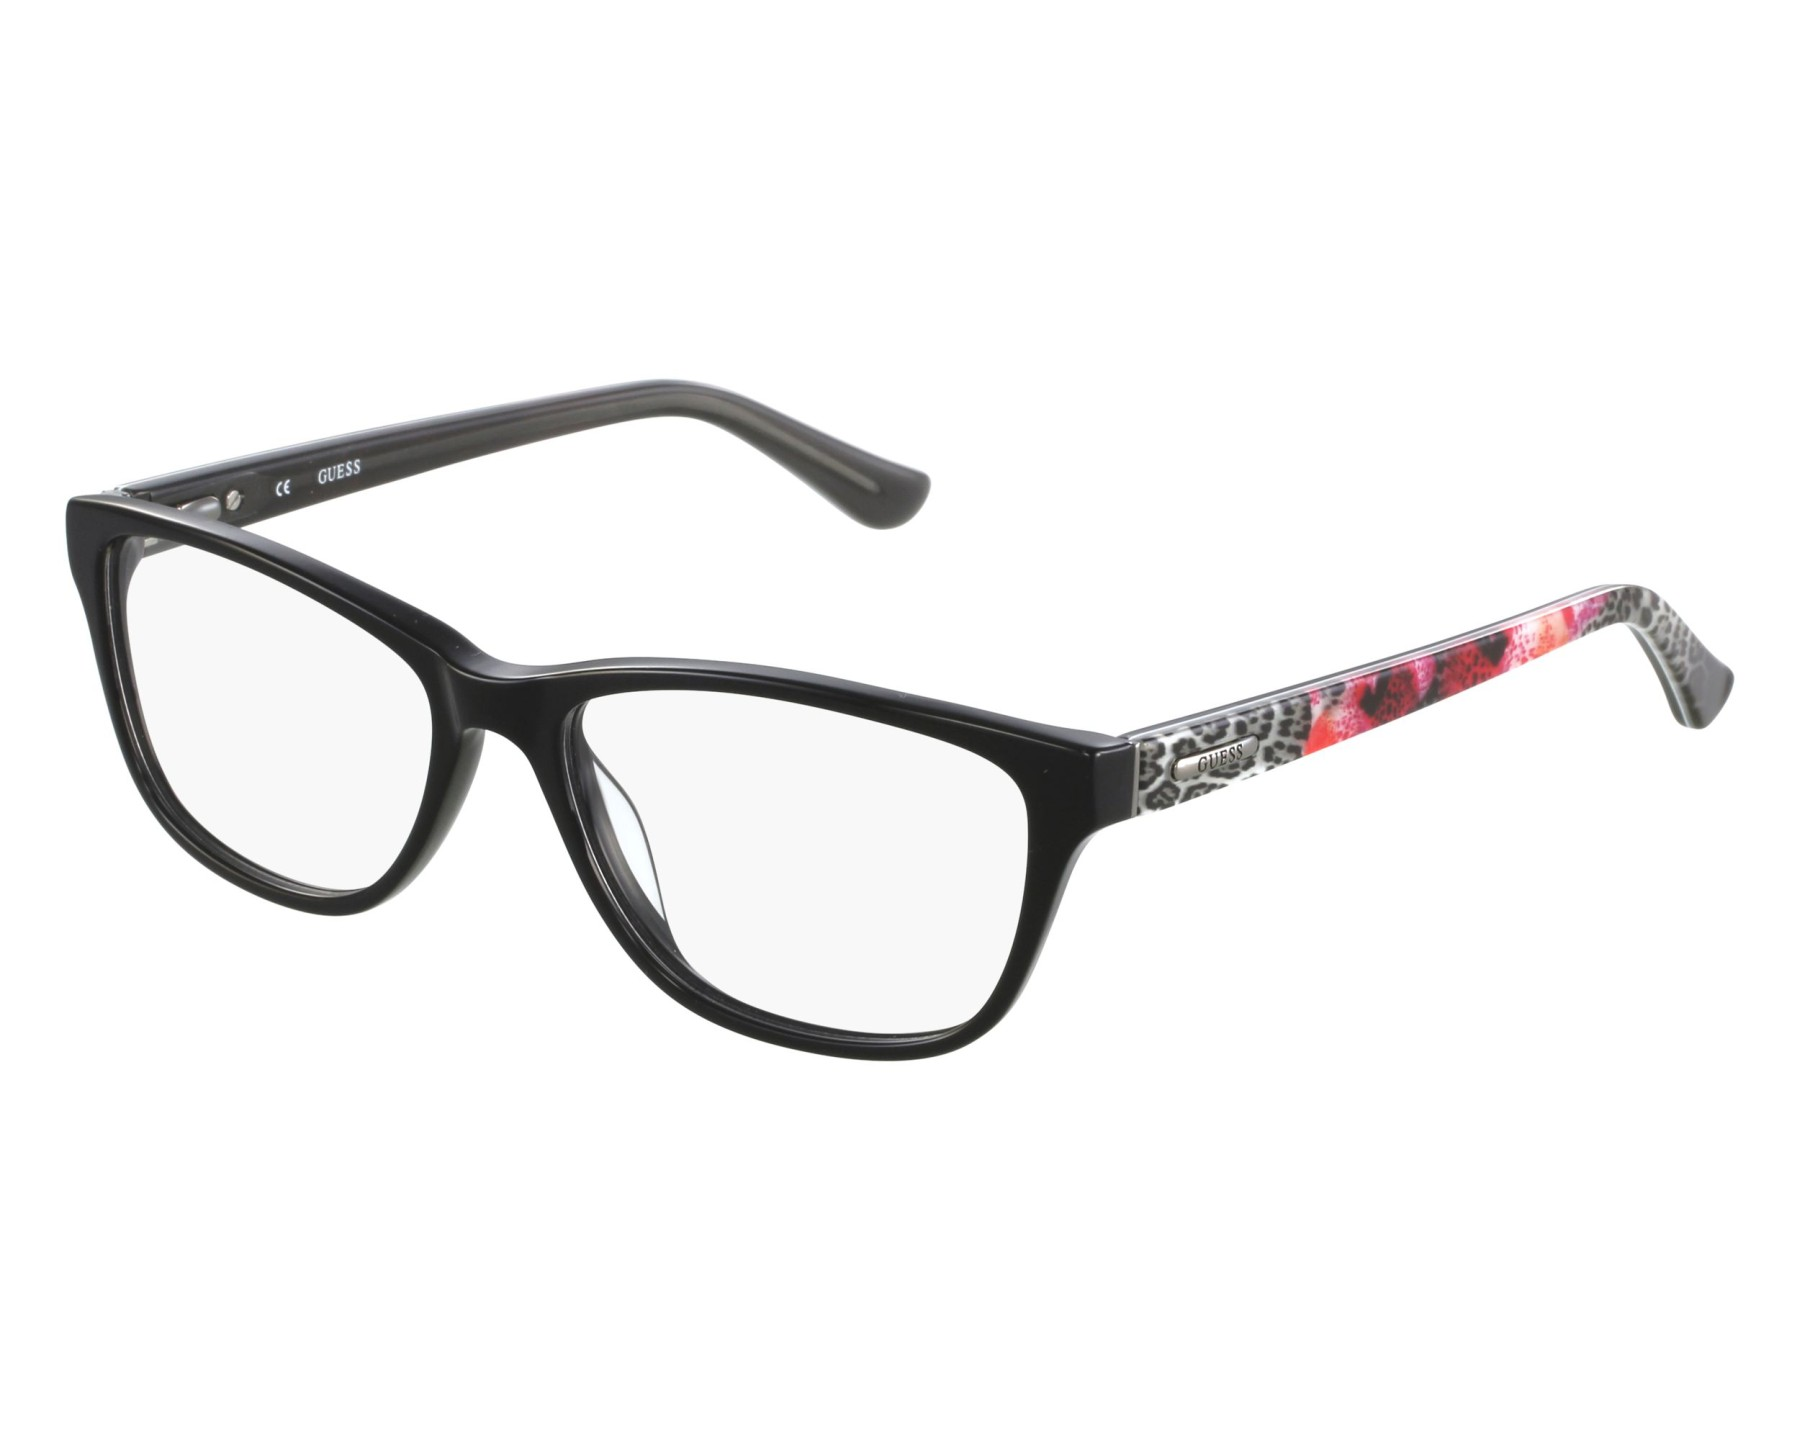 85792850b0 eyeglasses Guess GU-2513 001 - Black Mix front view